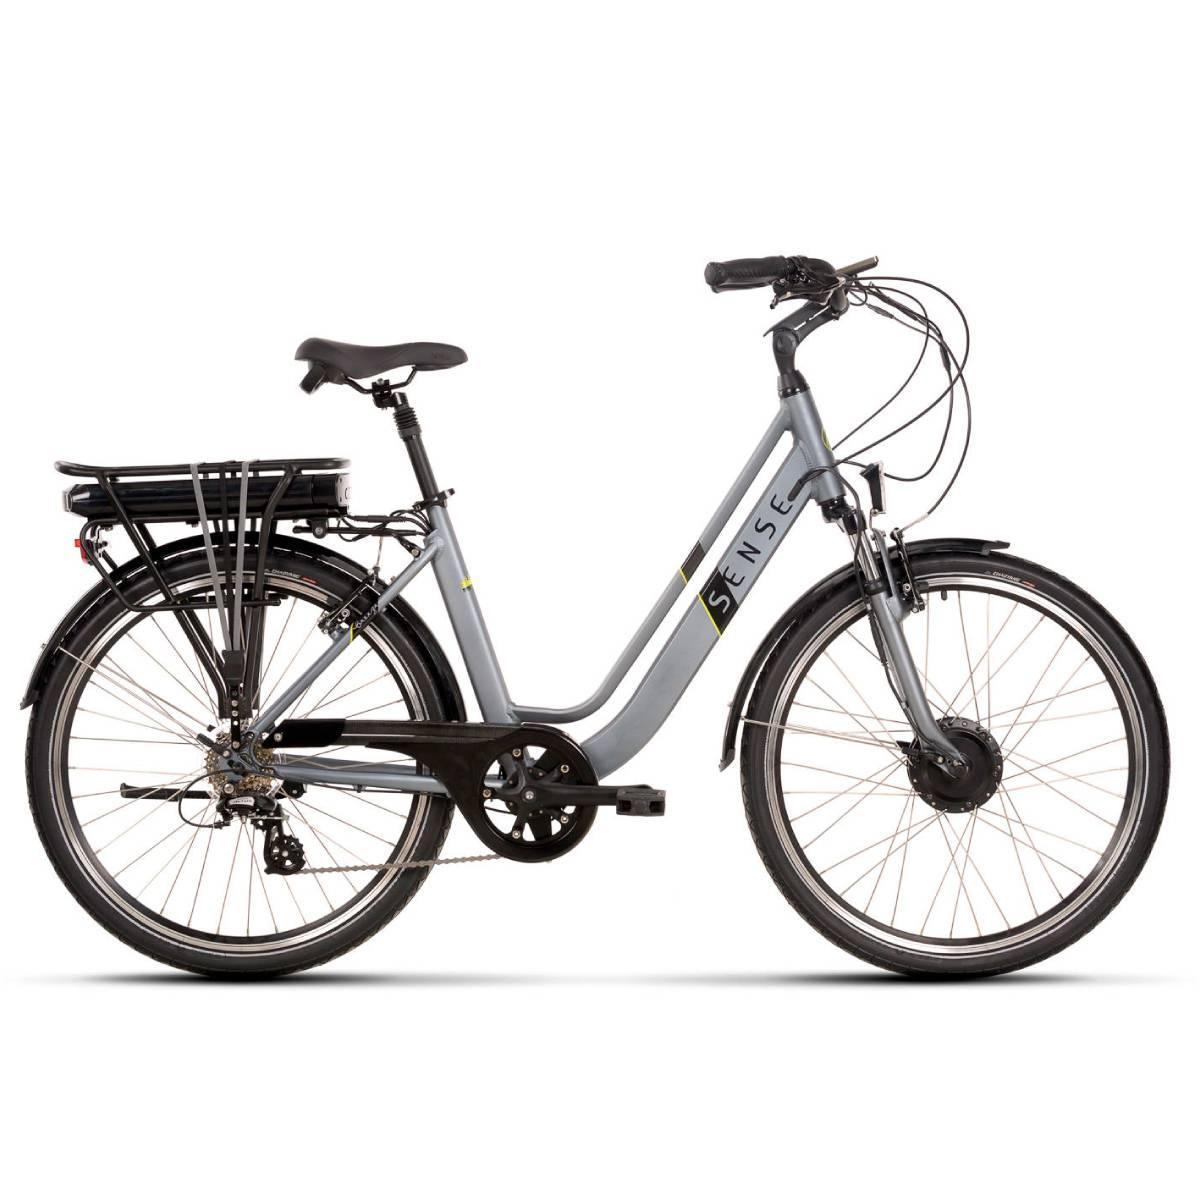 Bike Elétrica Sense Breeze 2020 Shimano 8v Aro 26